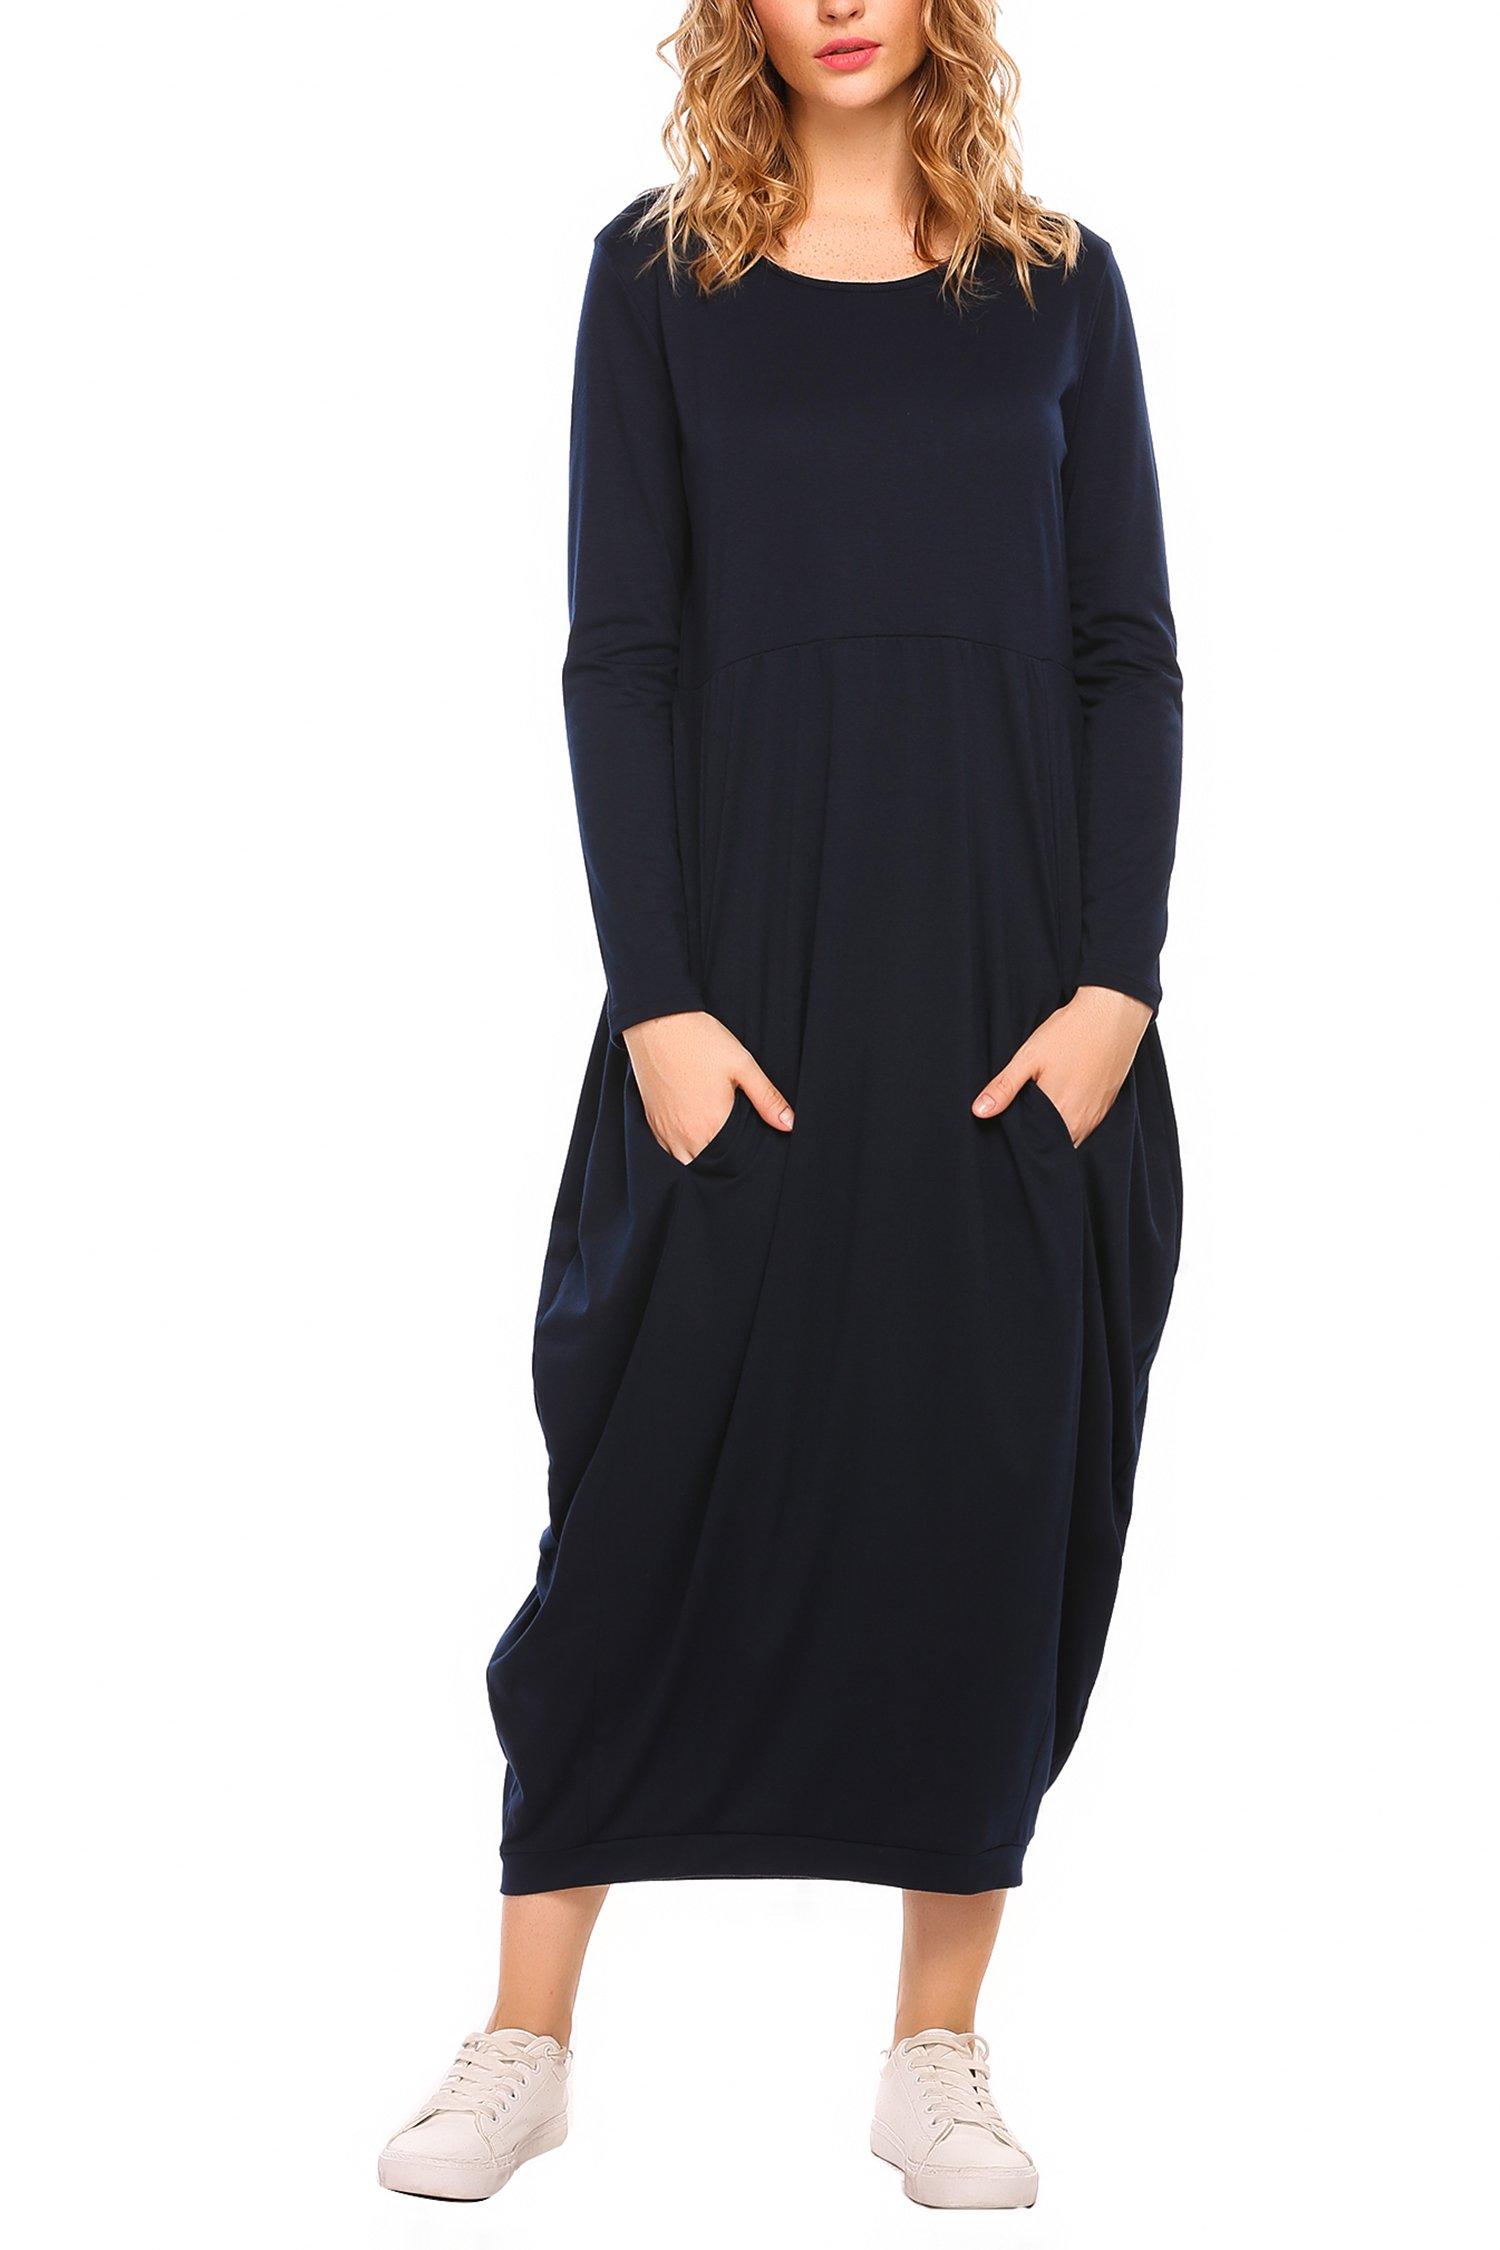 Zeagoo Women Casual Long Dress Long Sleeve Loose Fit Pockets Maxi Dress Navy Small